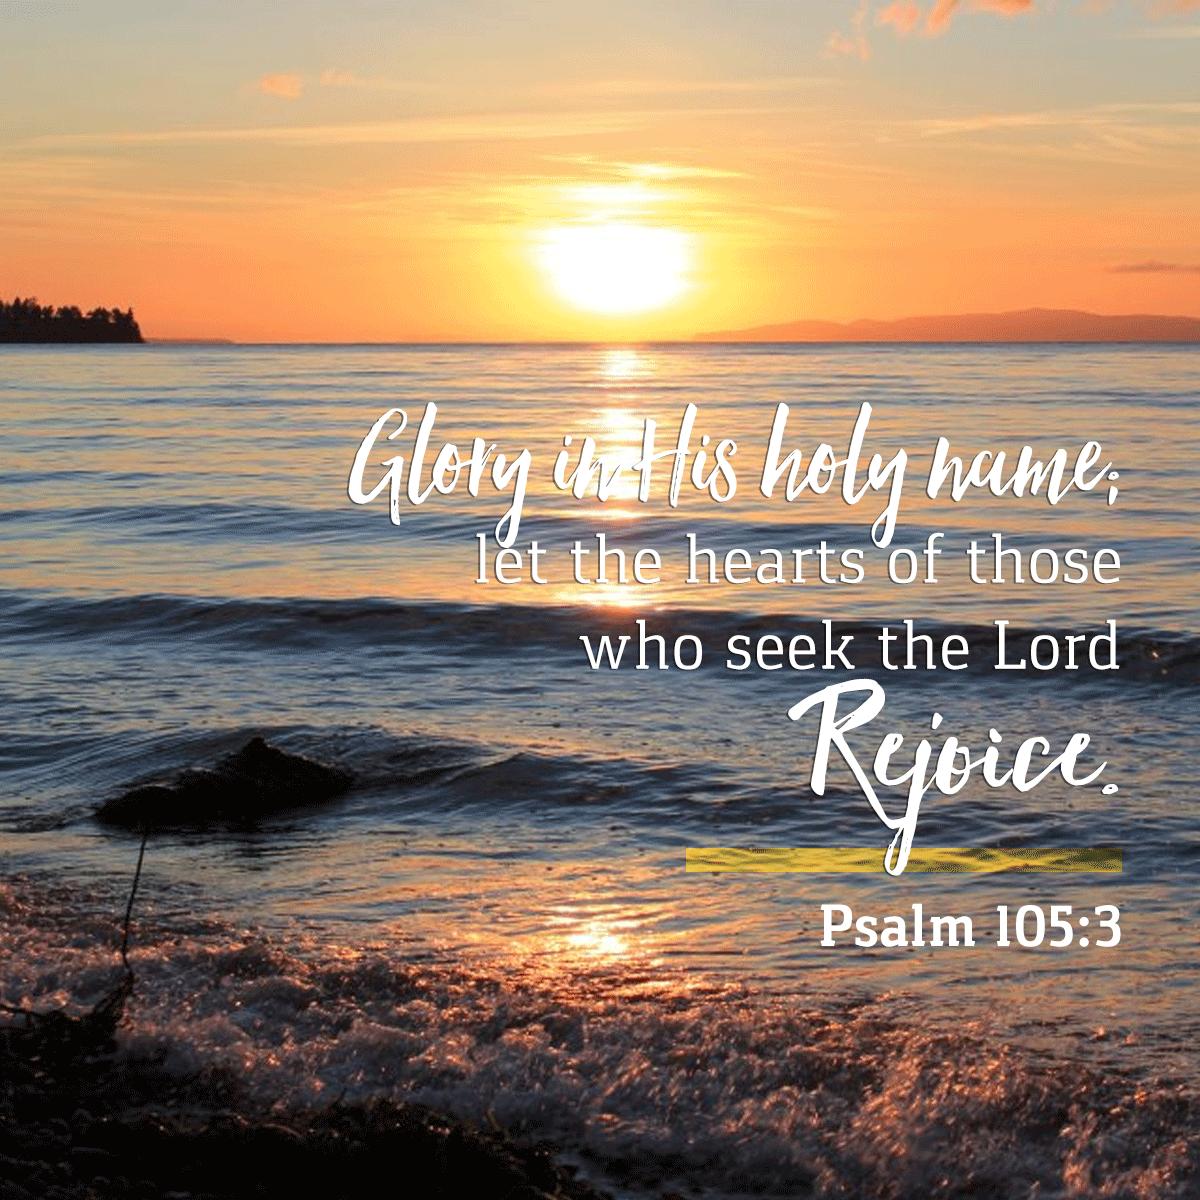 Psalm 105:3